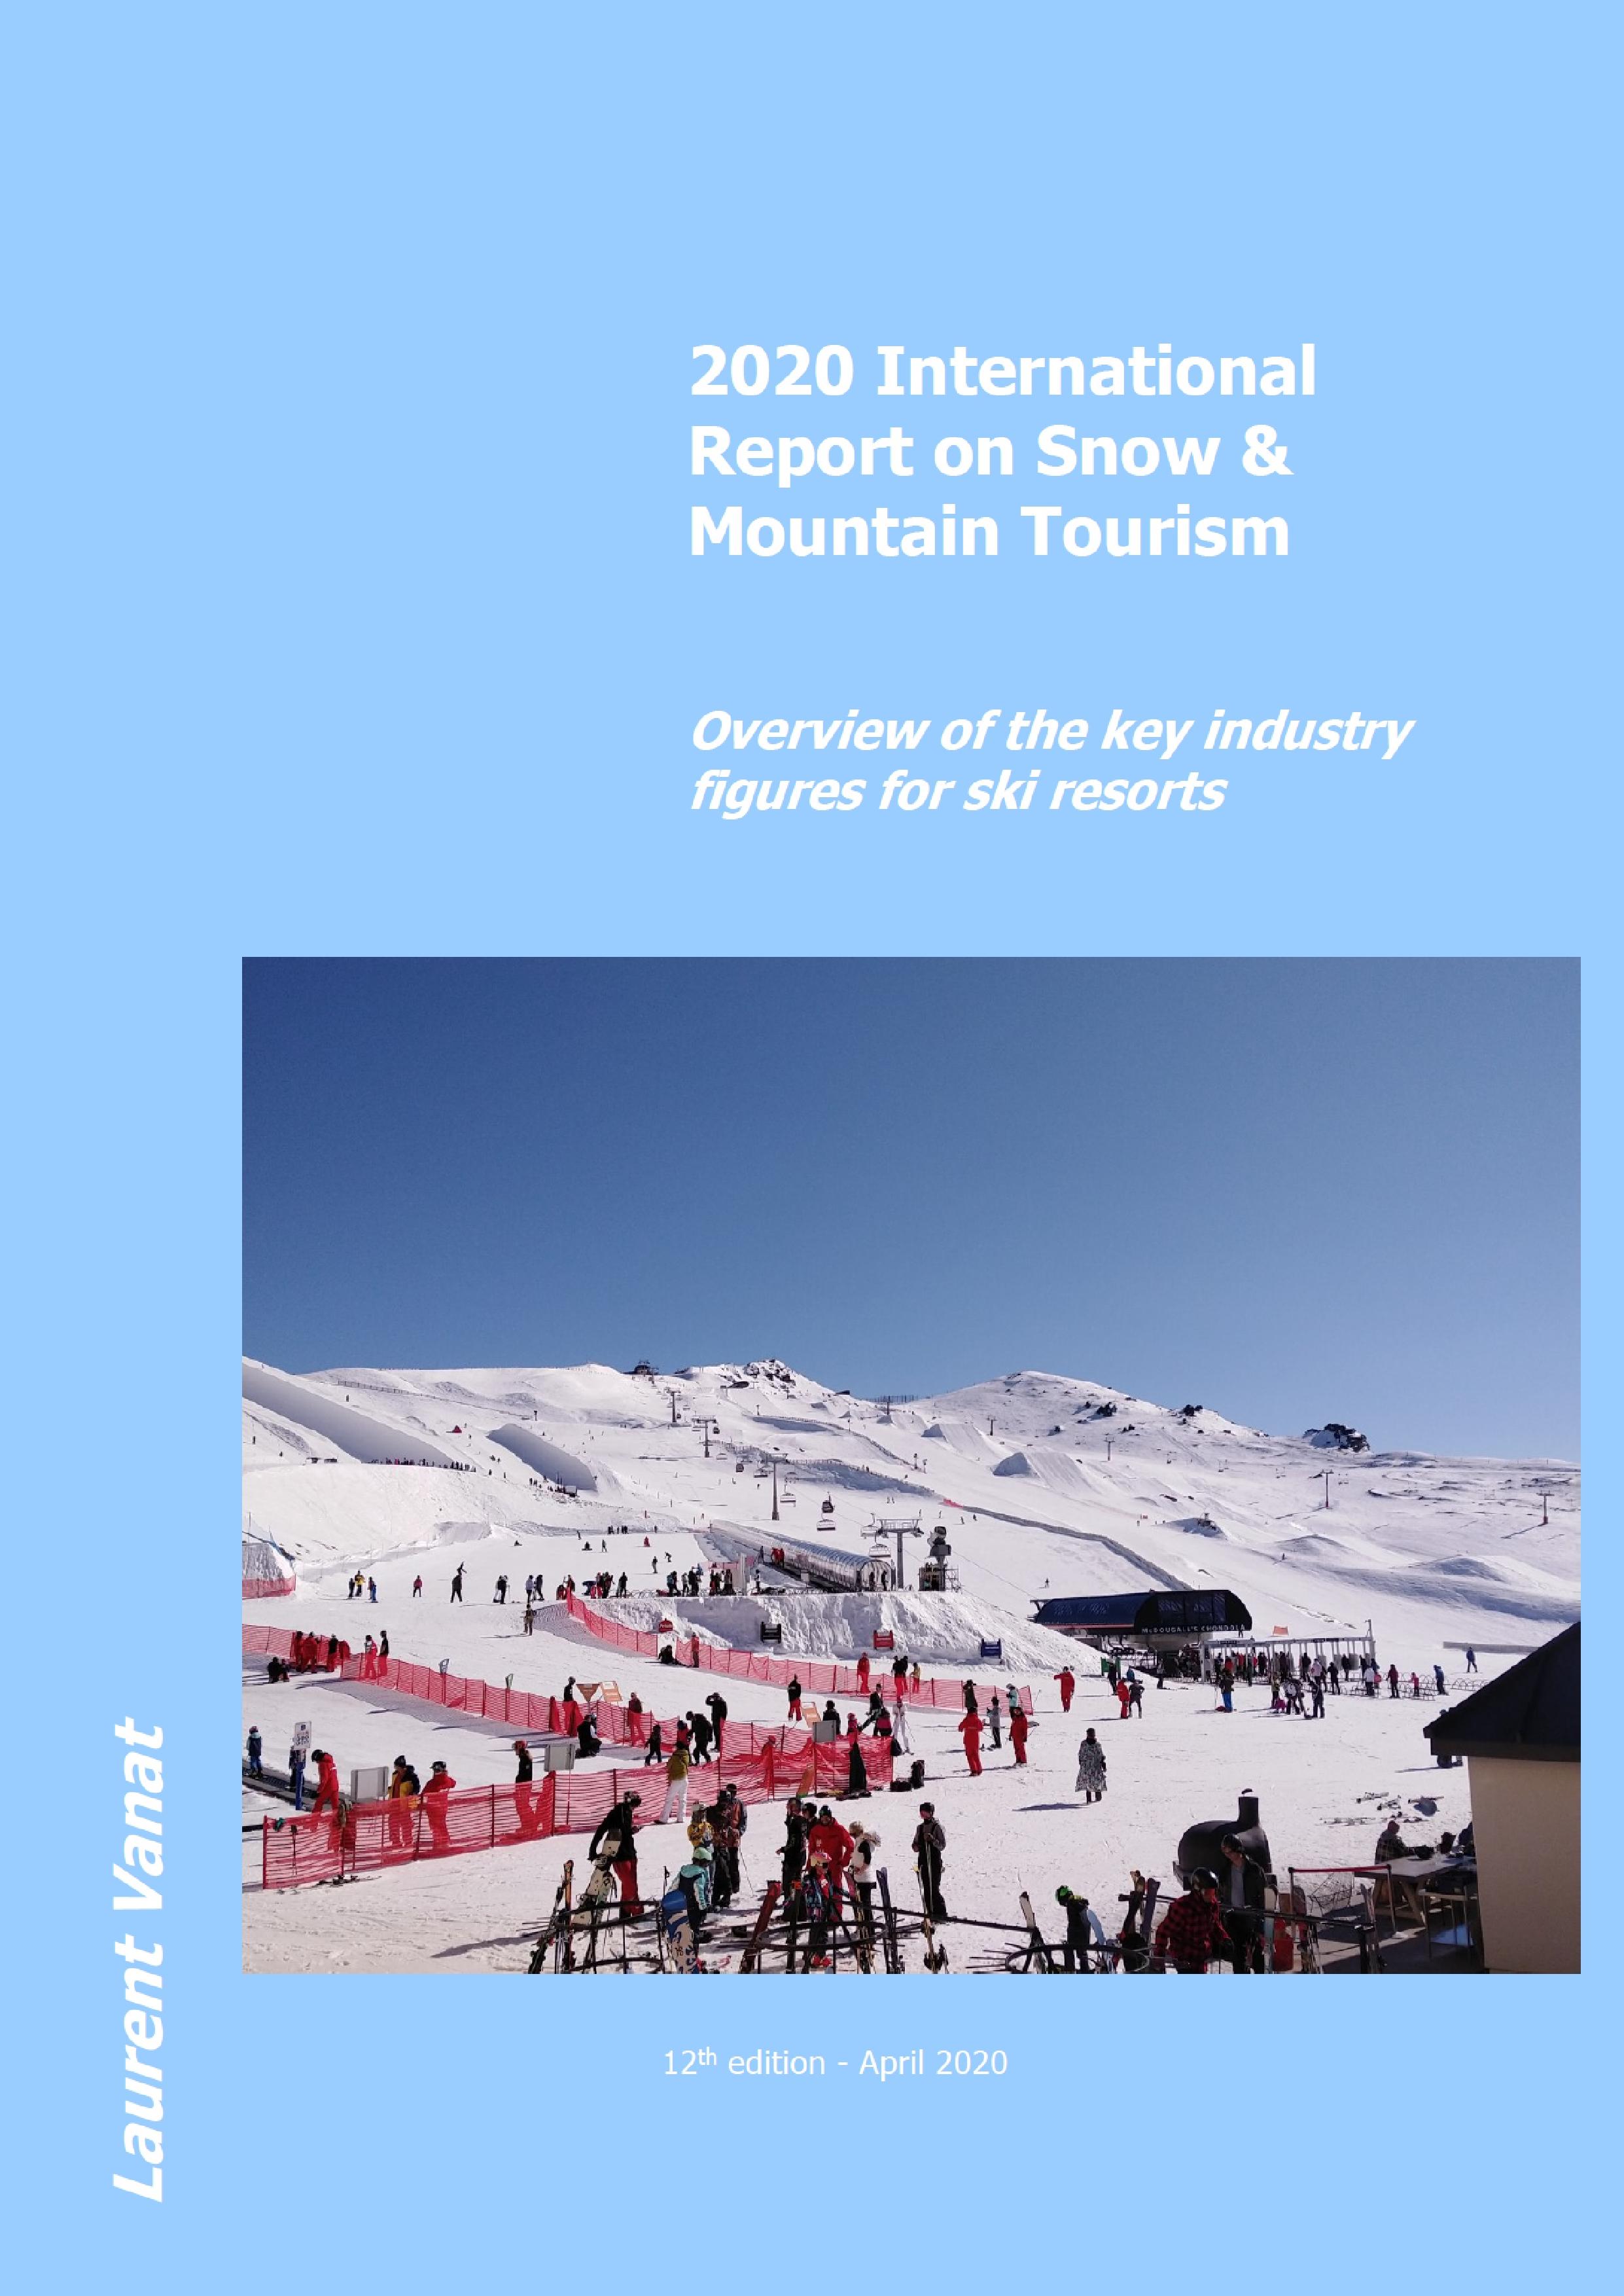 2020 International Snow Report